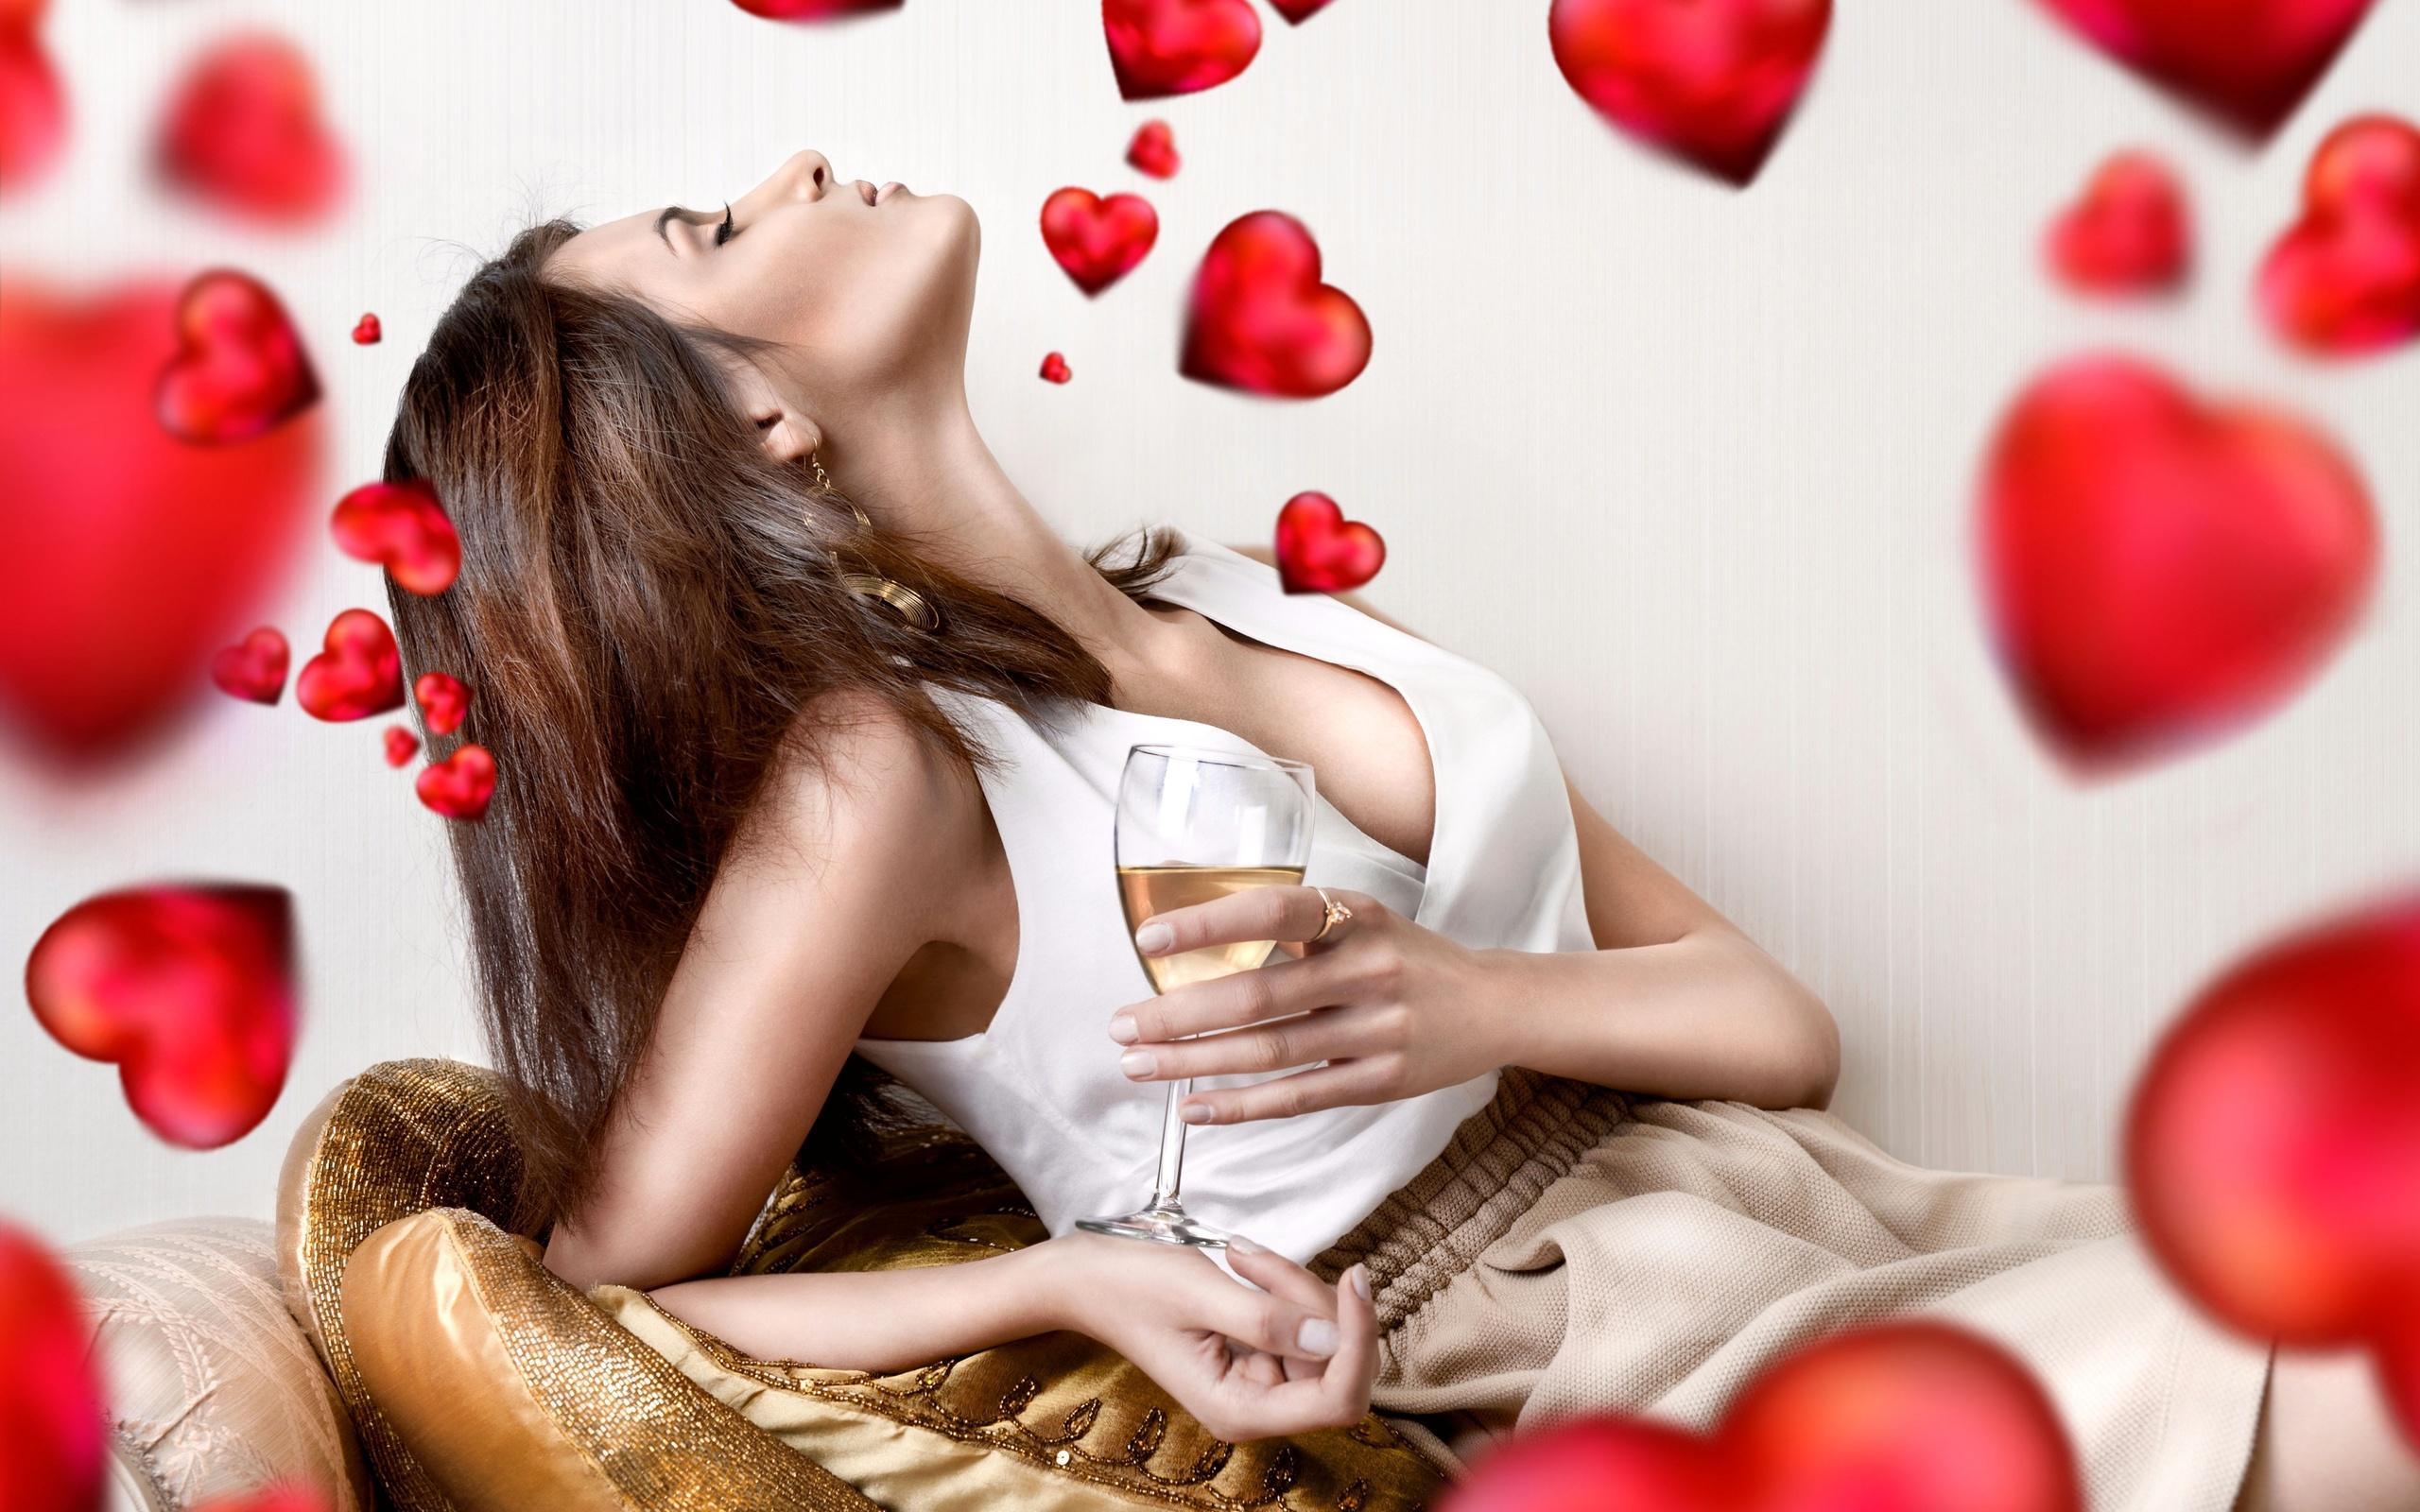 Картинки с сердцами и с девушками